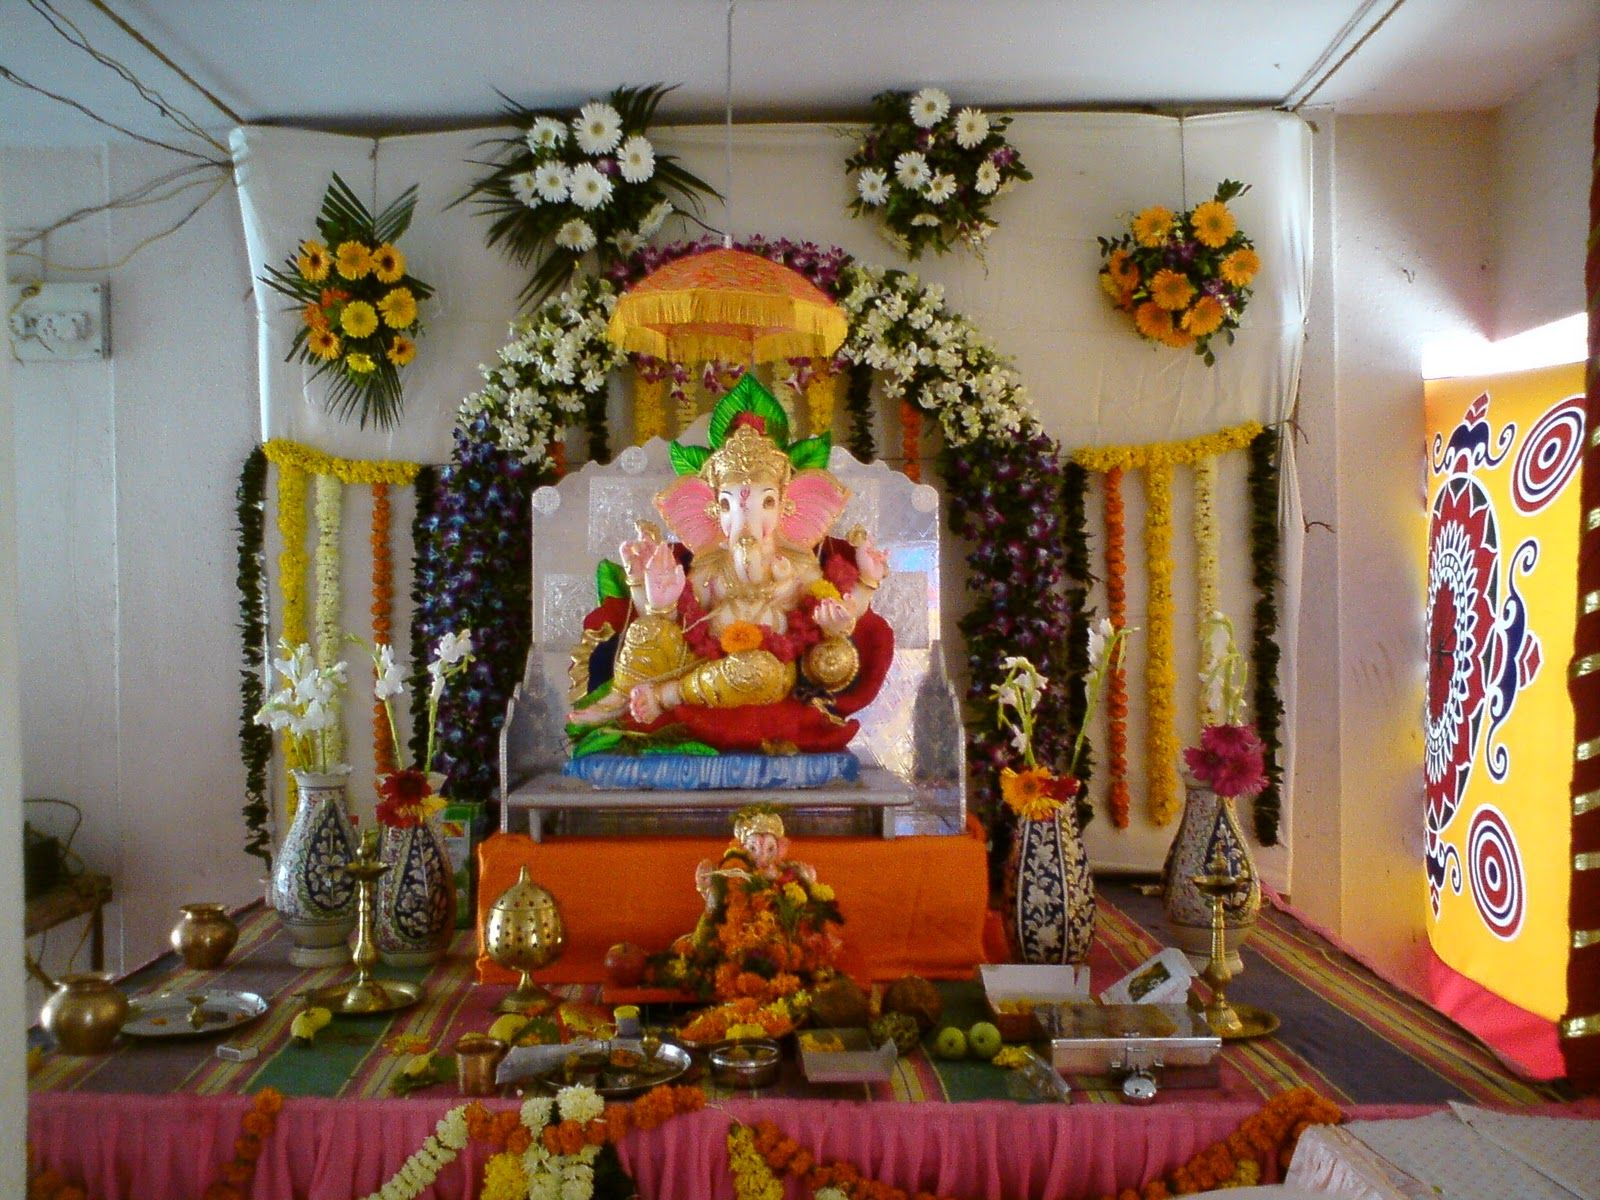 Best Kitchen Gallery: Ganpati Pandal Decoration Lord Ganesha Pinterest Decoration of Hindu Altar At Home on rachelxblog.com